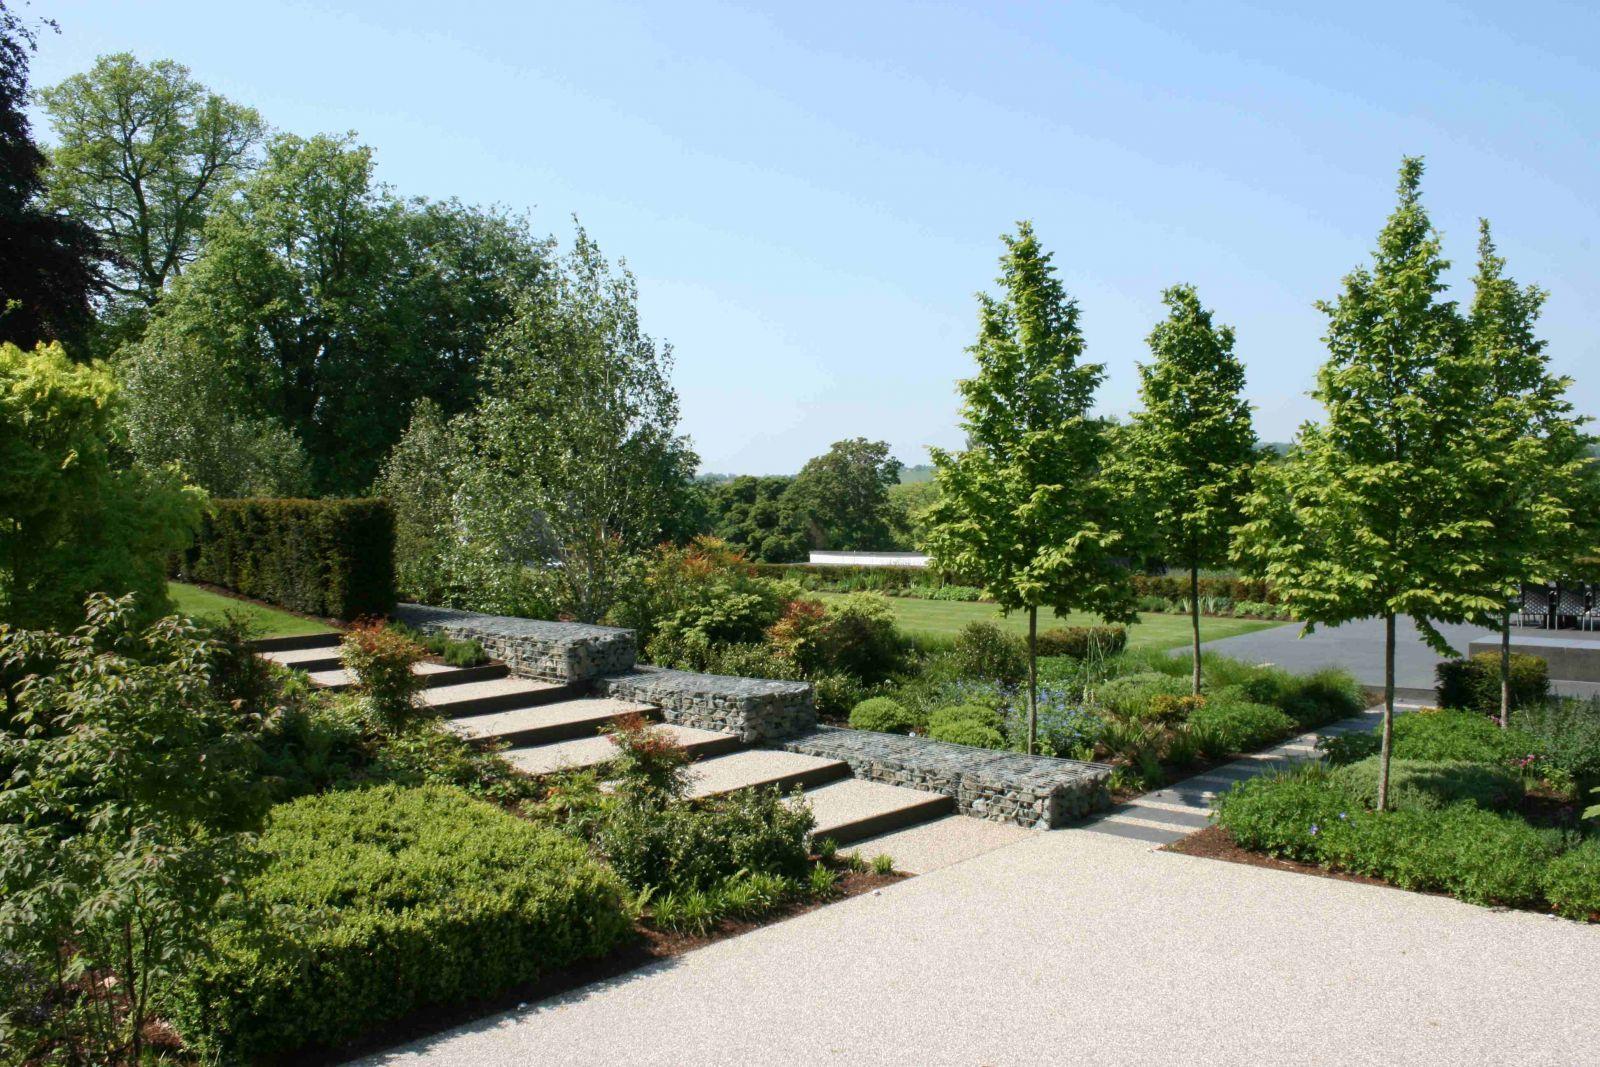 Award Winning Gardens Landscaping Big Plant Nursery Twyford Berkshire For All Your Garden Plants Garden Design Landscape Architecture Plants